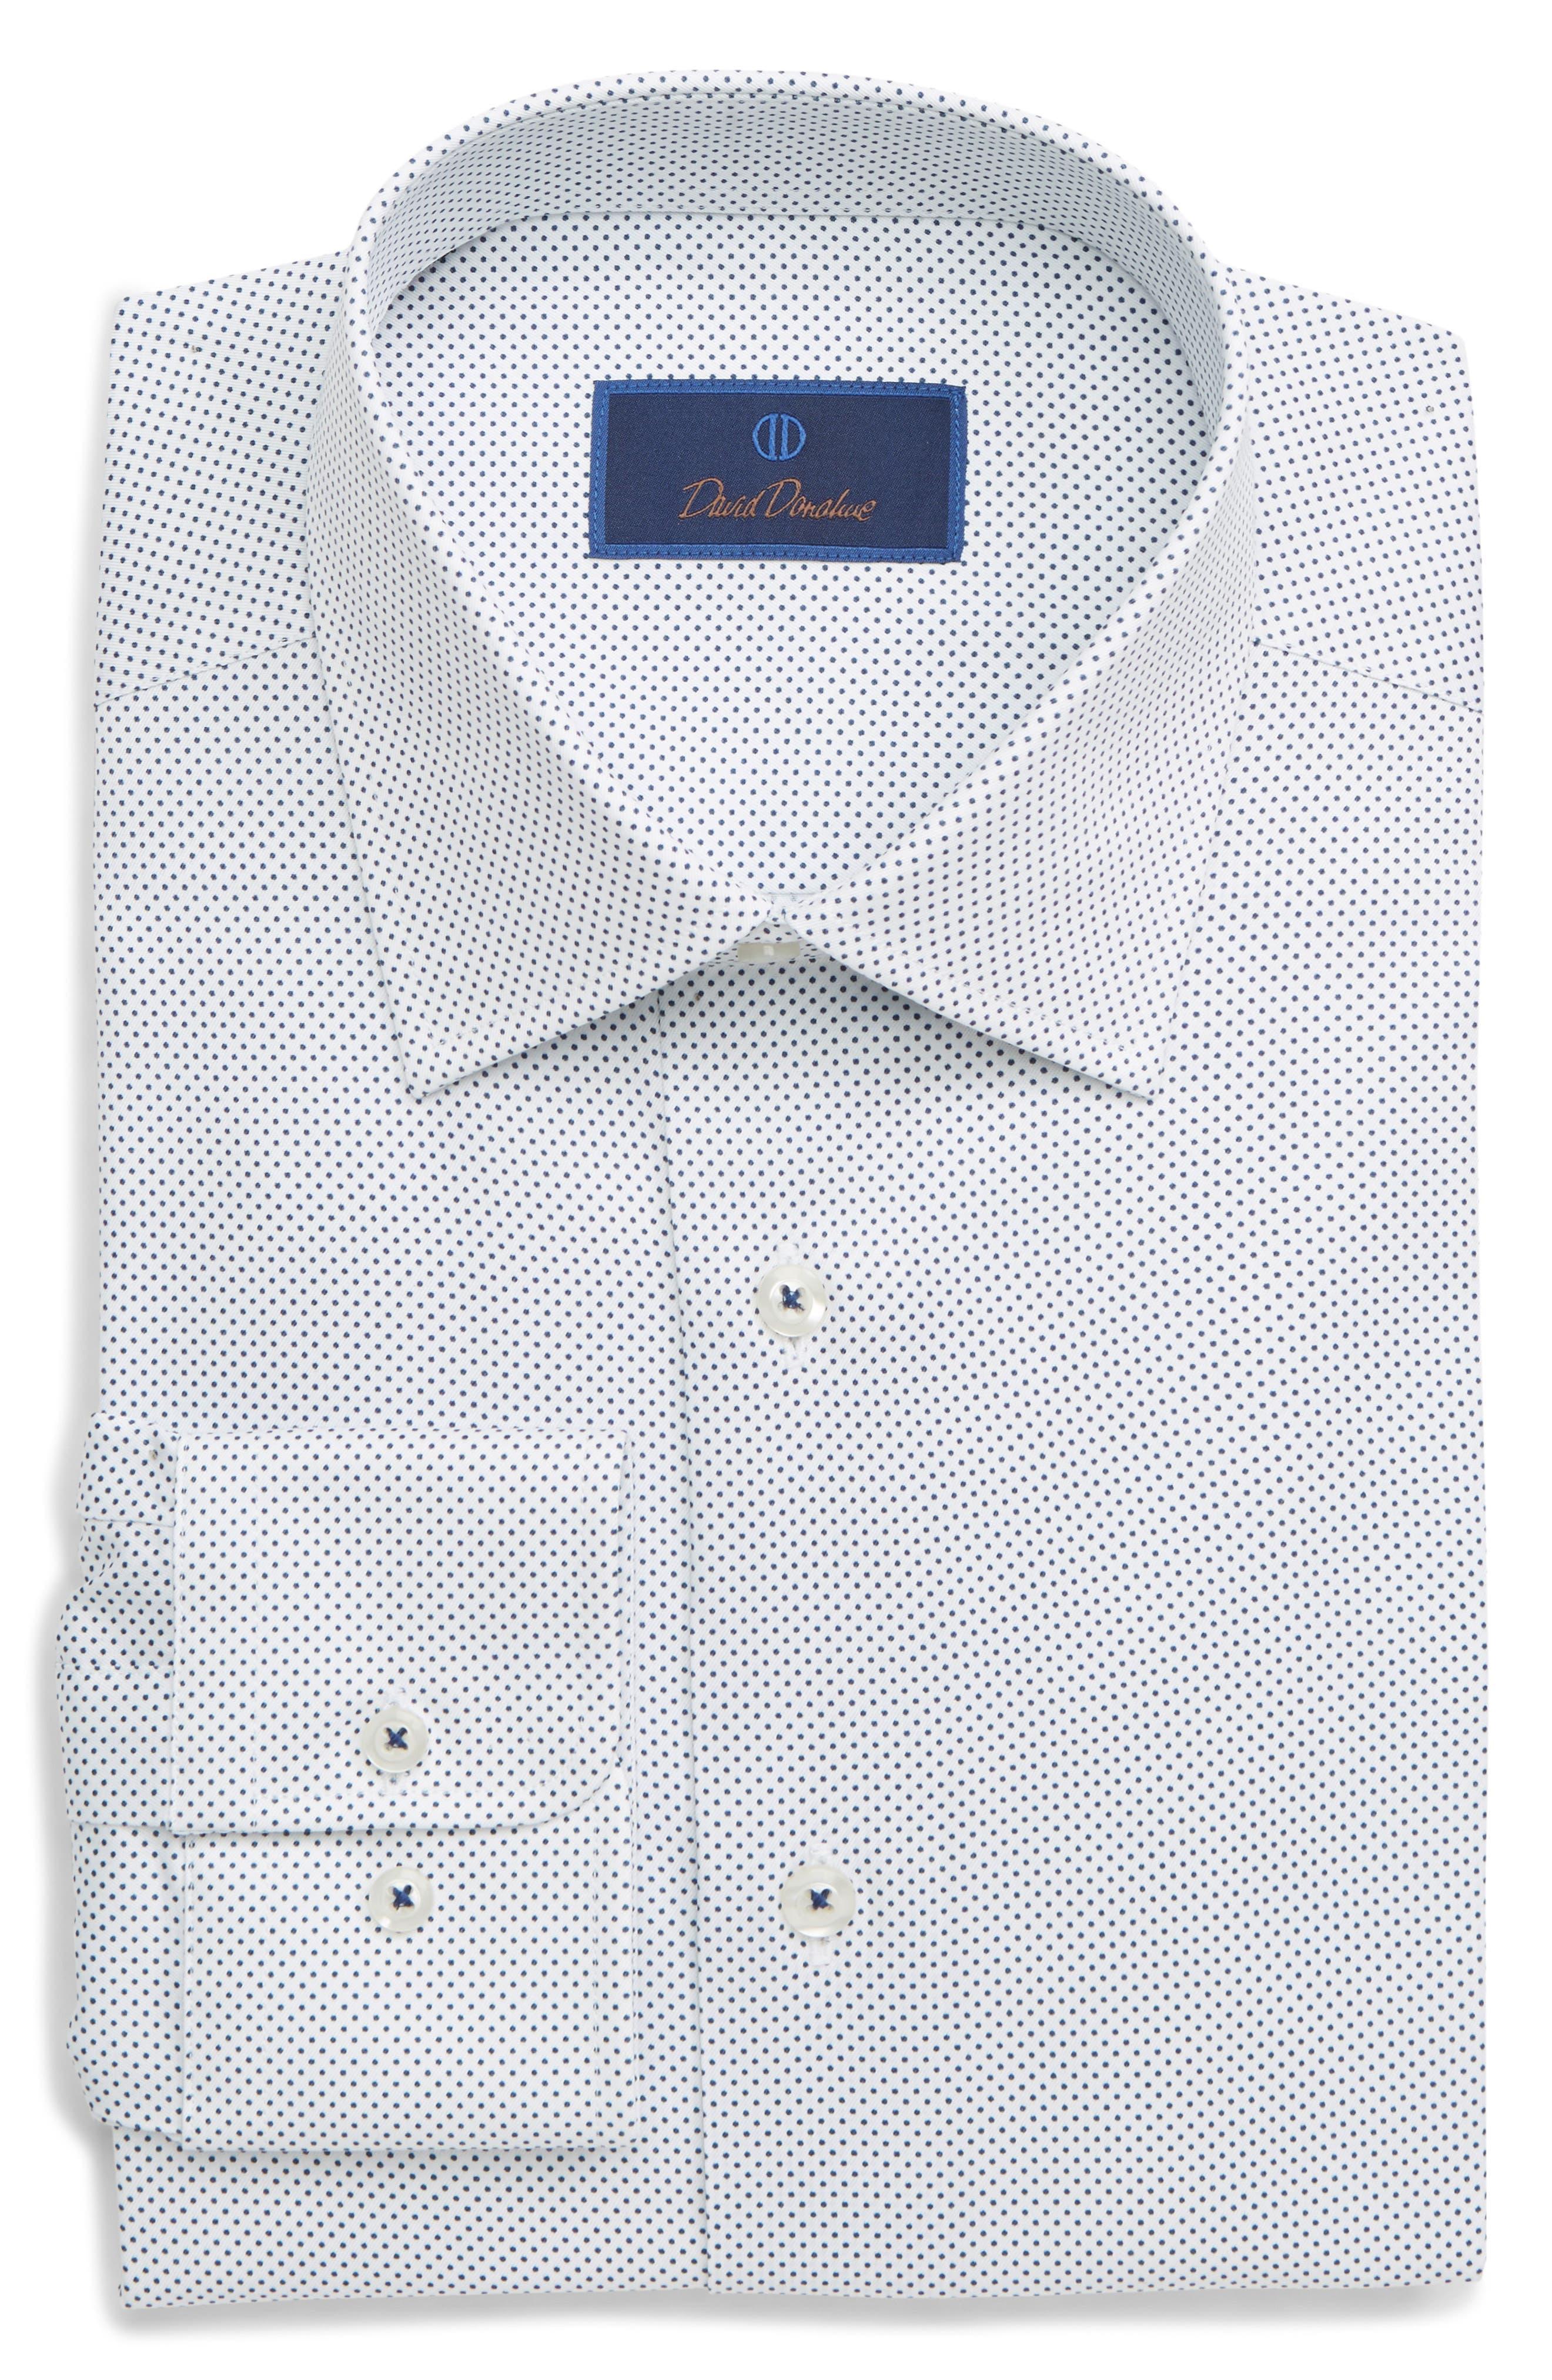 DAVID DONAHUE,                             Regular Fit Dot Dress Shirt,                             Main thumbnail 1, color,                             WHITE/ NAVY